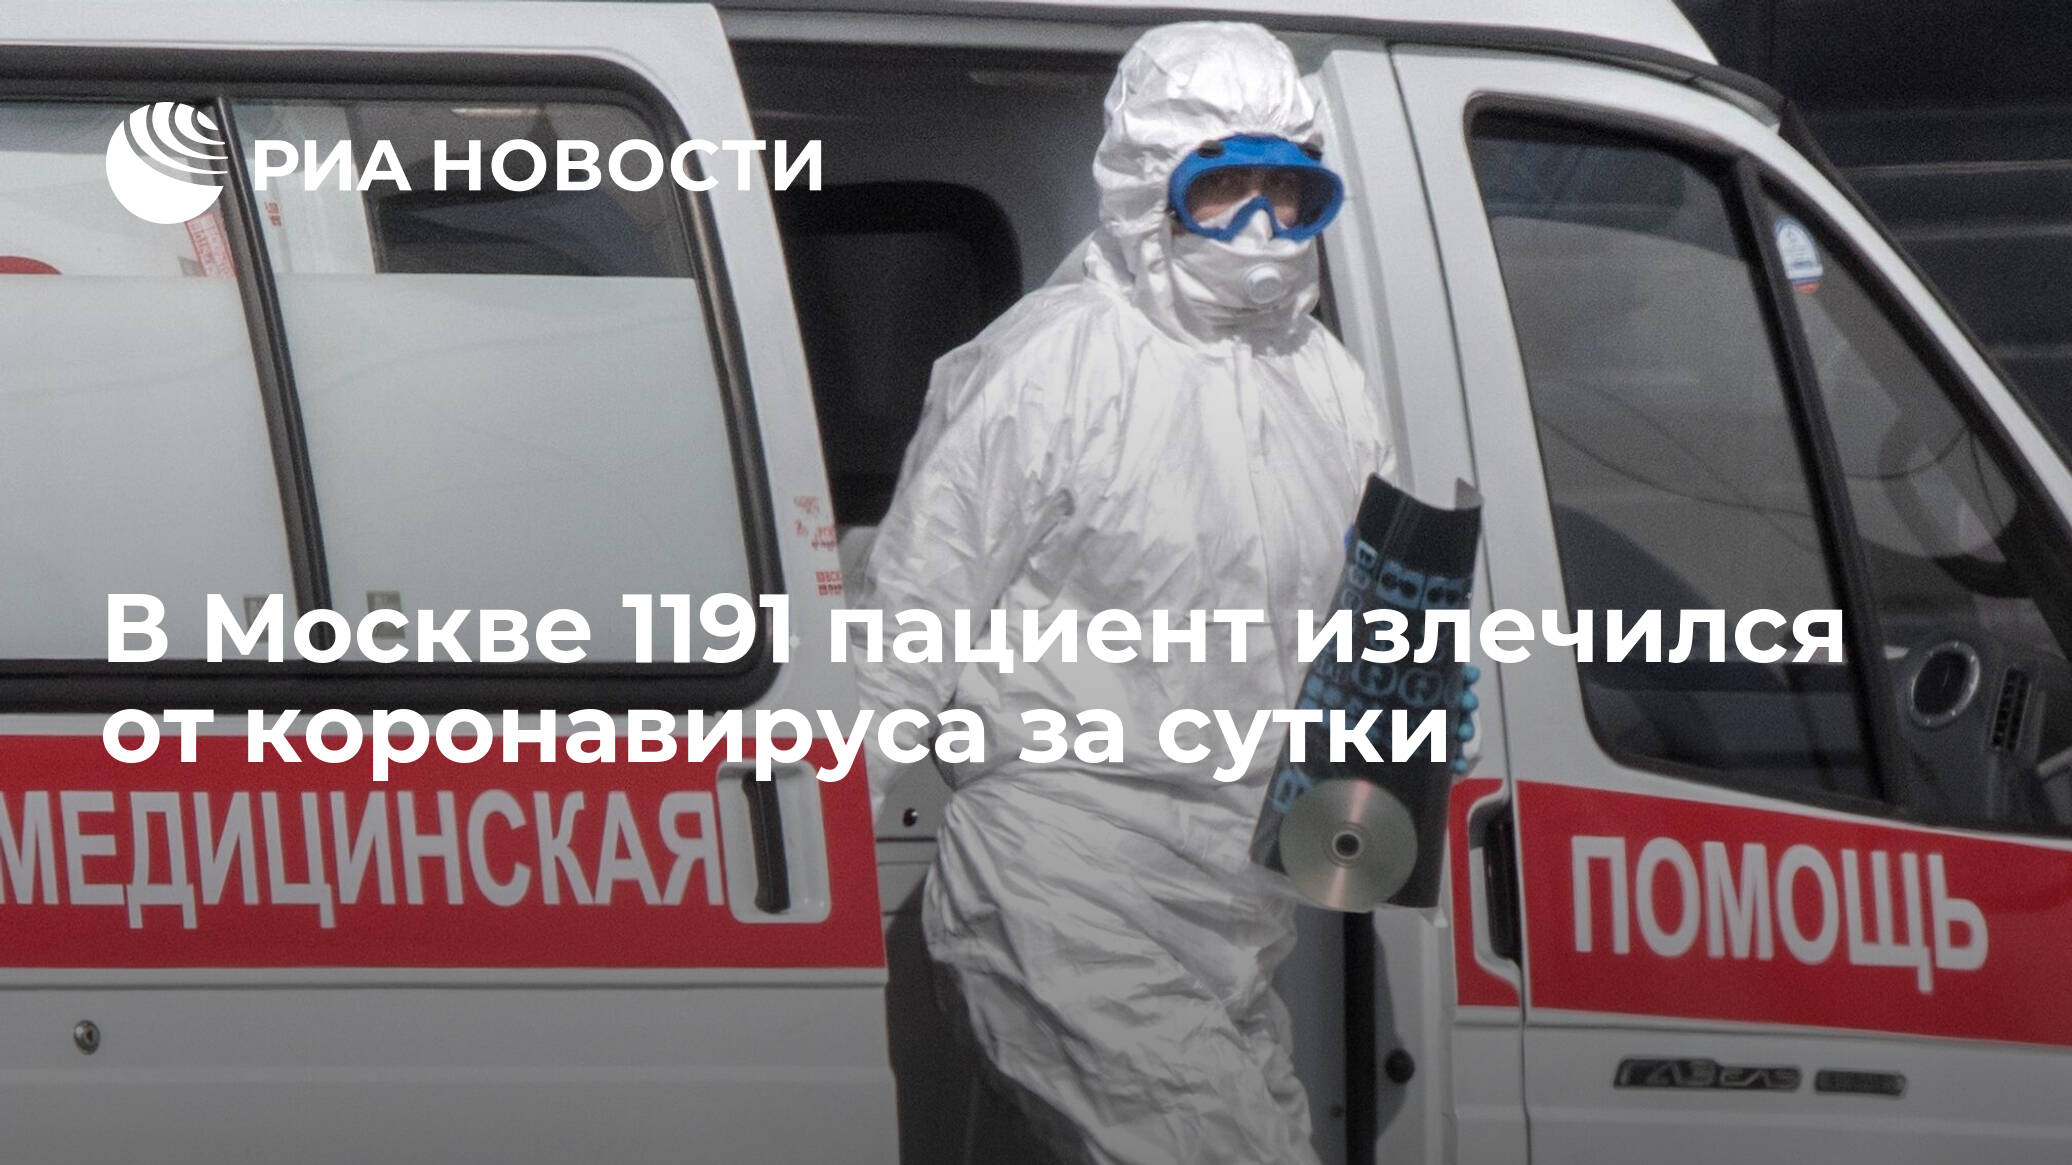 В Москве 1191 пациент излечился от коронавируса за сутки